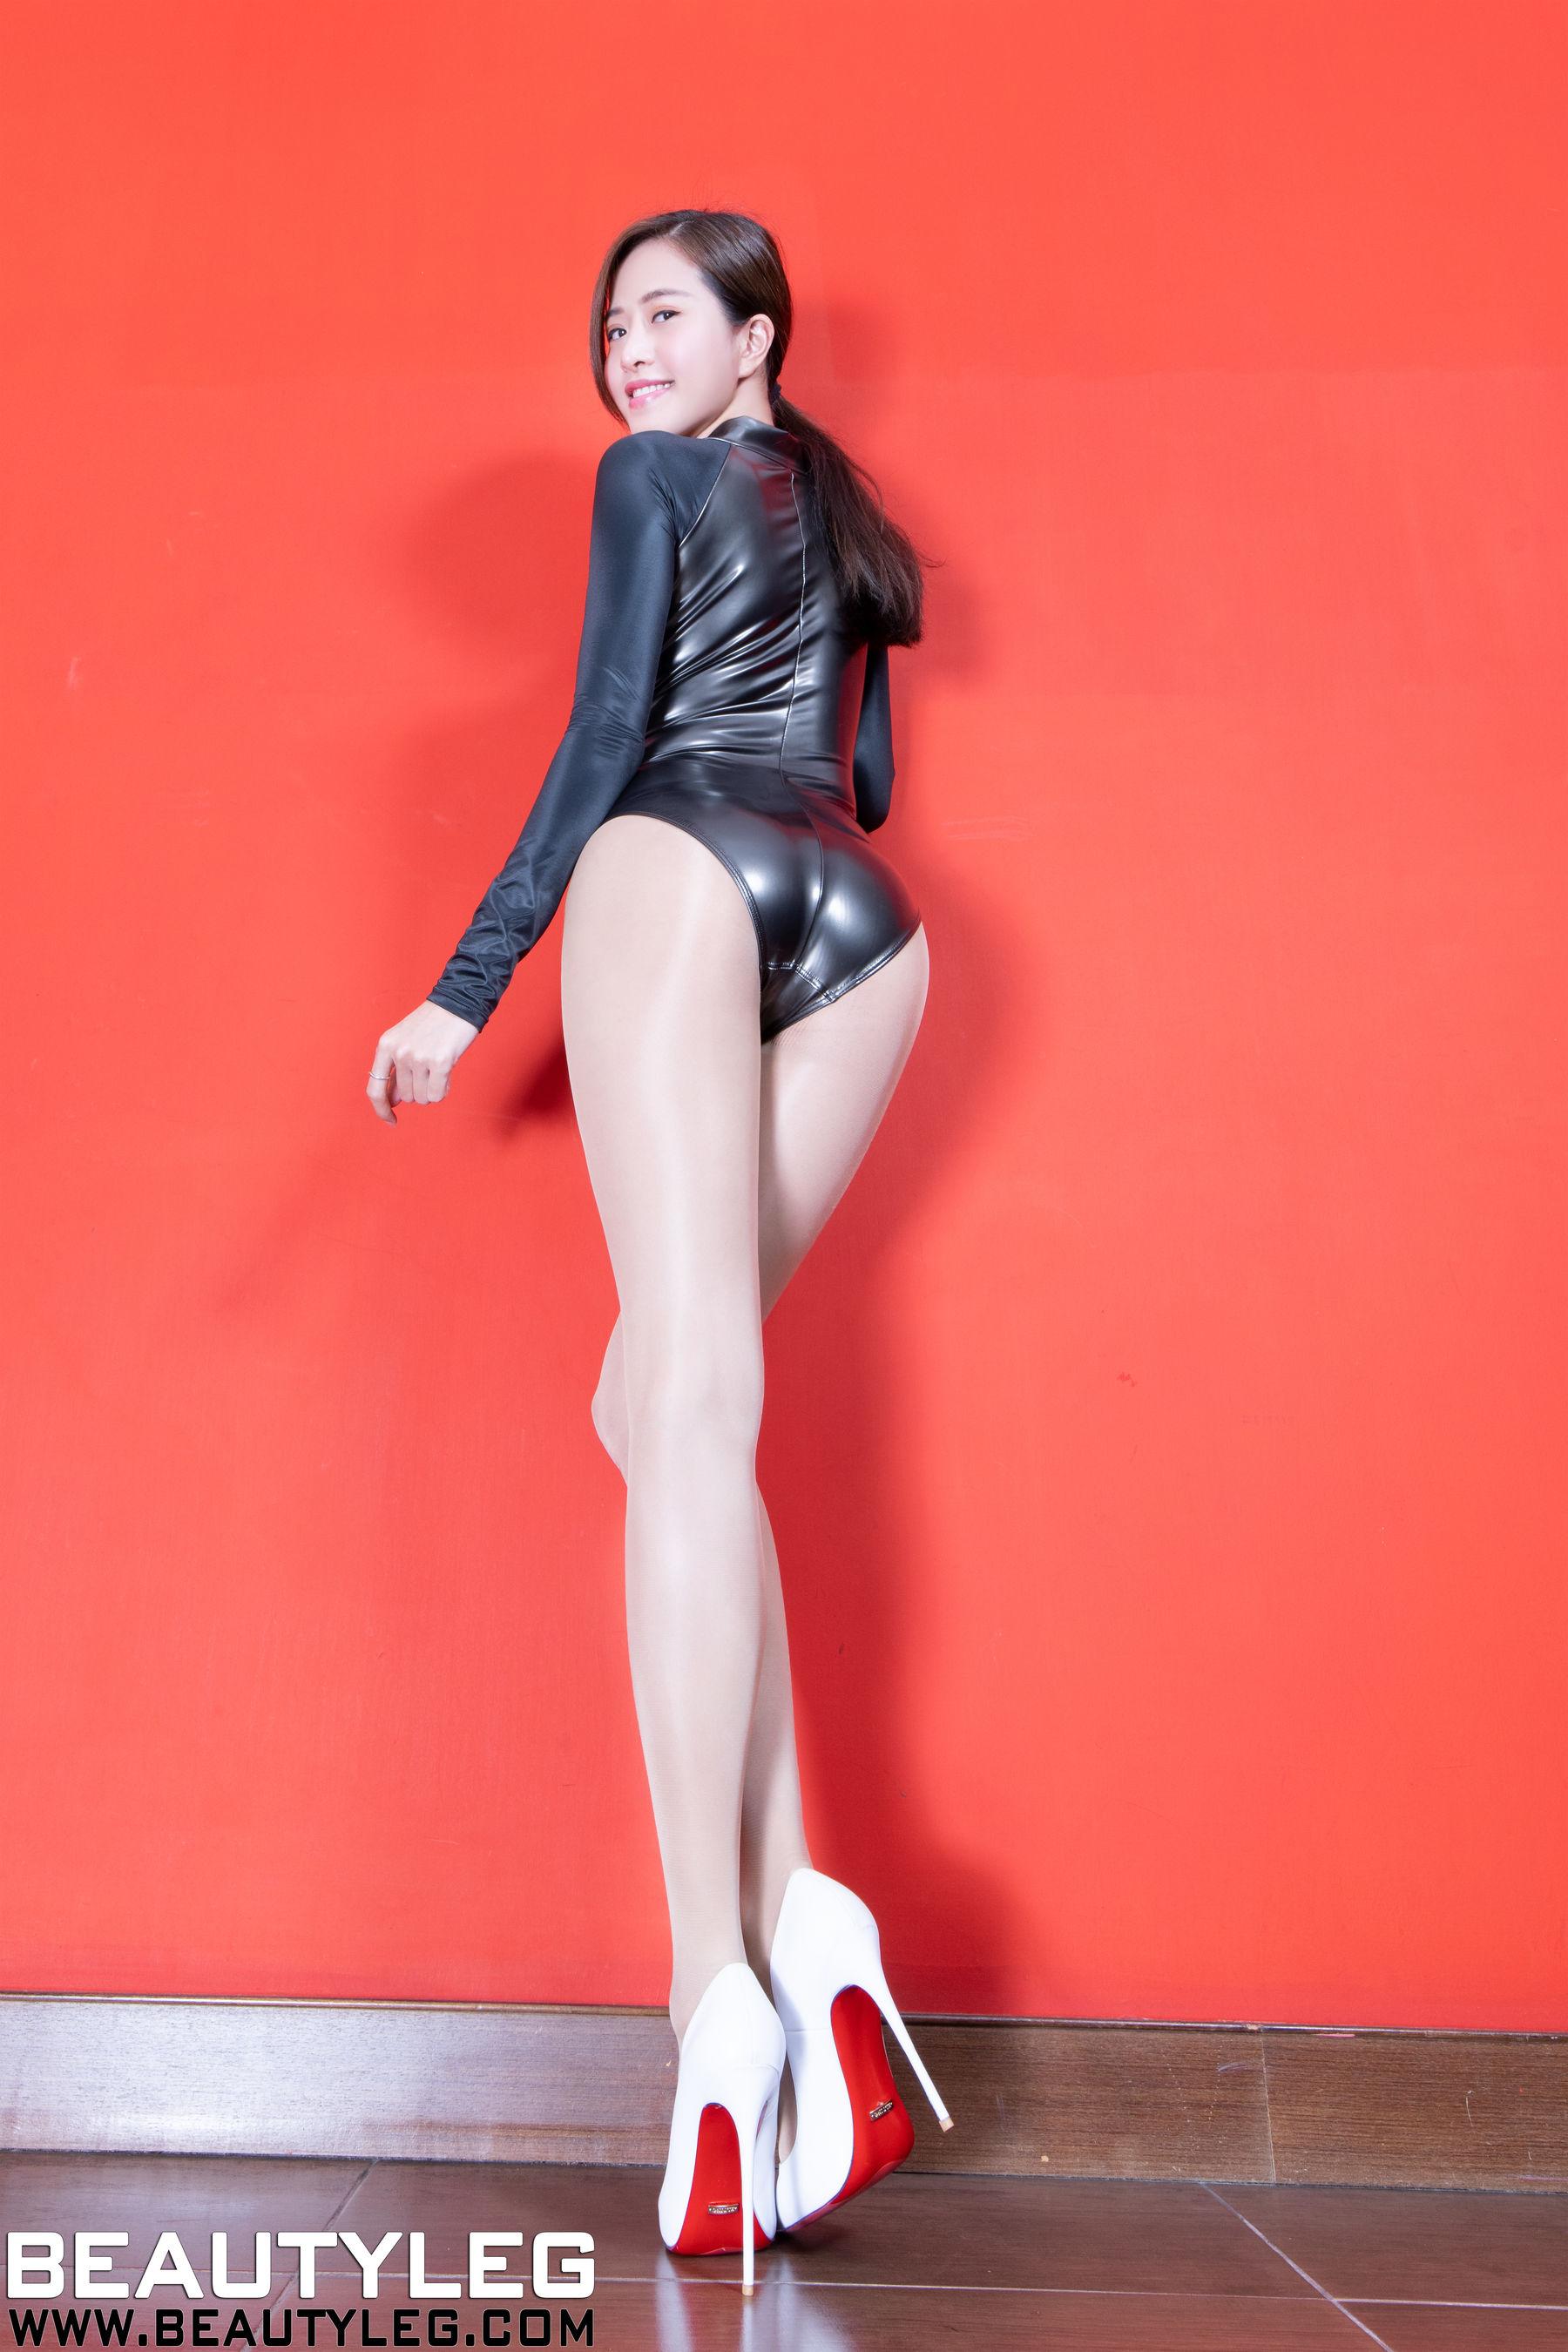 VOL.1621 [Beautyleg]肉丝美腿:张欣慈(腿模Olivia)超高清个人性感漂亮大图(48P)